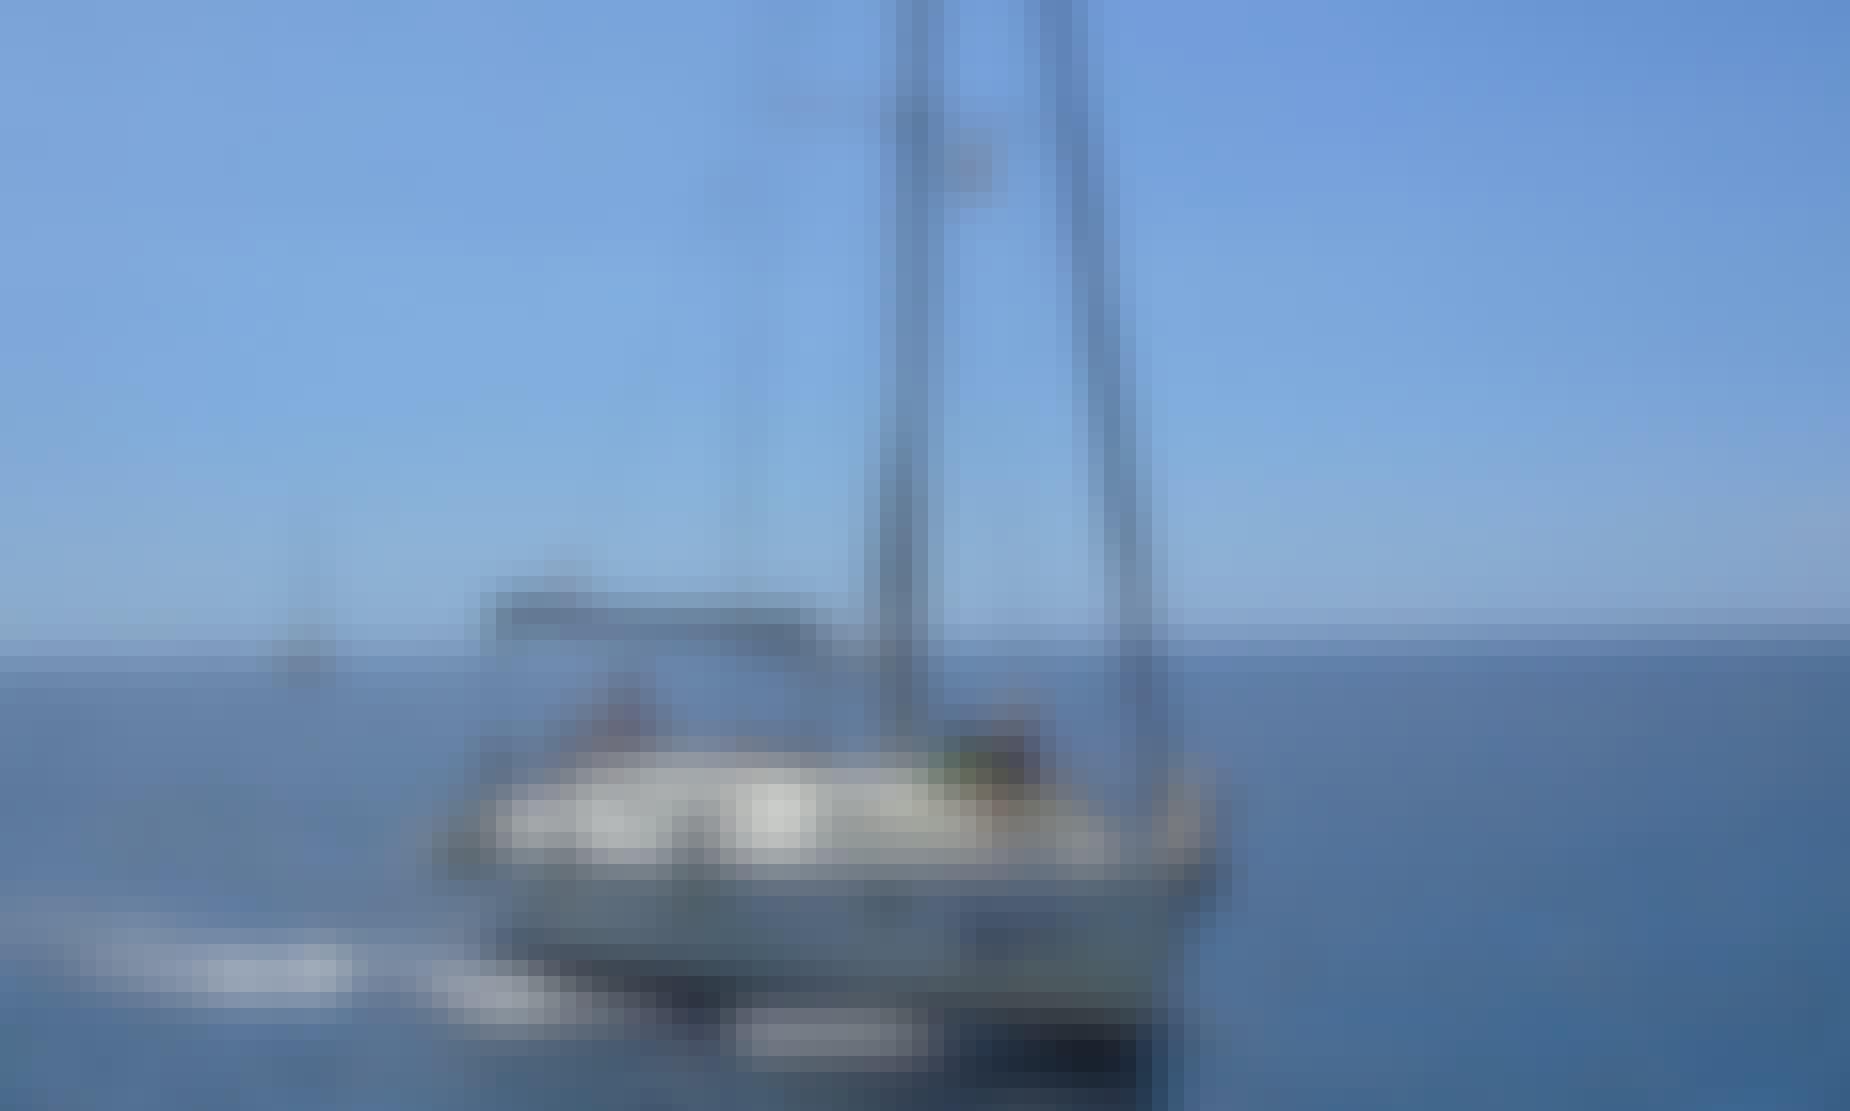 Tour Santa Cruz de Tenerife, Spain On-board a 39' Jeanneau Skyline 1 Cruising Monohull